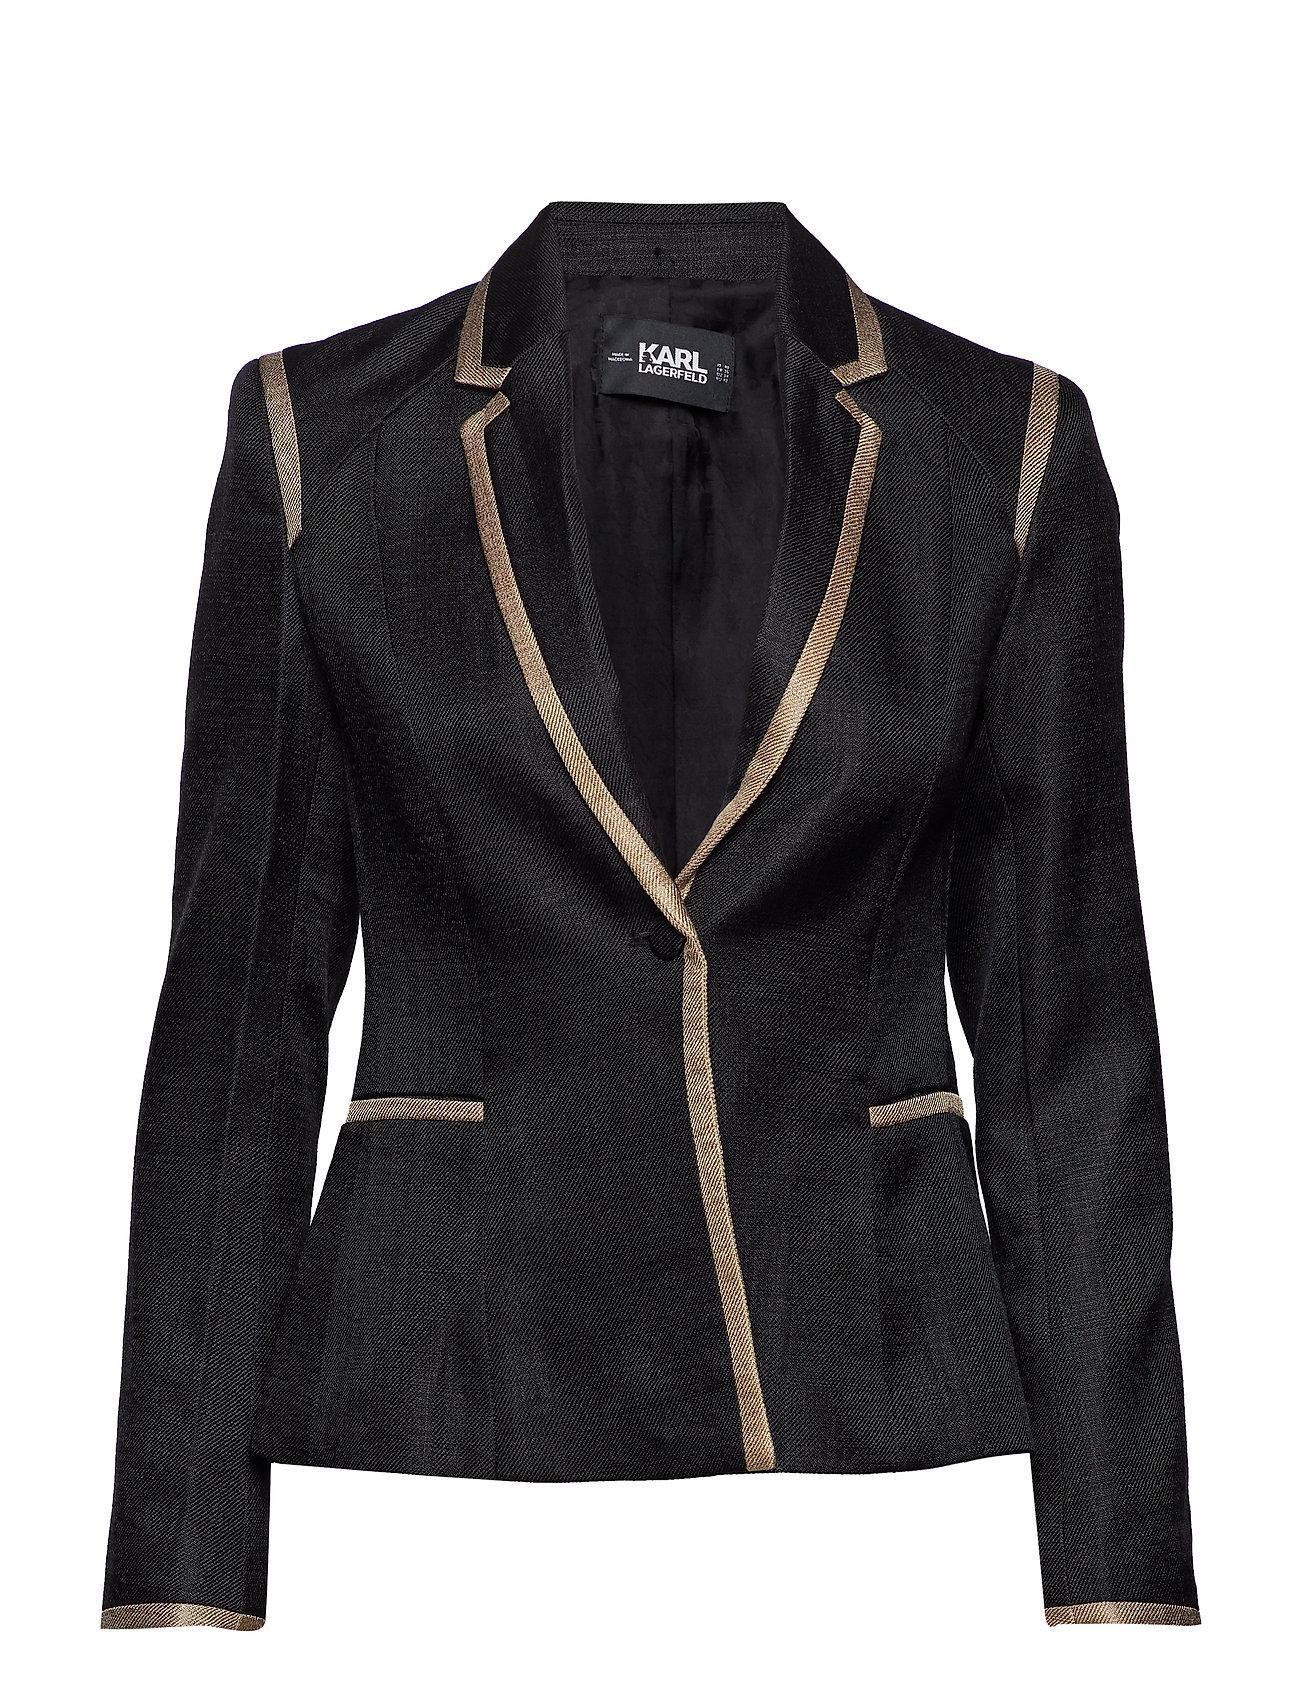 Karl Lagerfeld Tailored Twill Blazer W/Piping